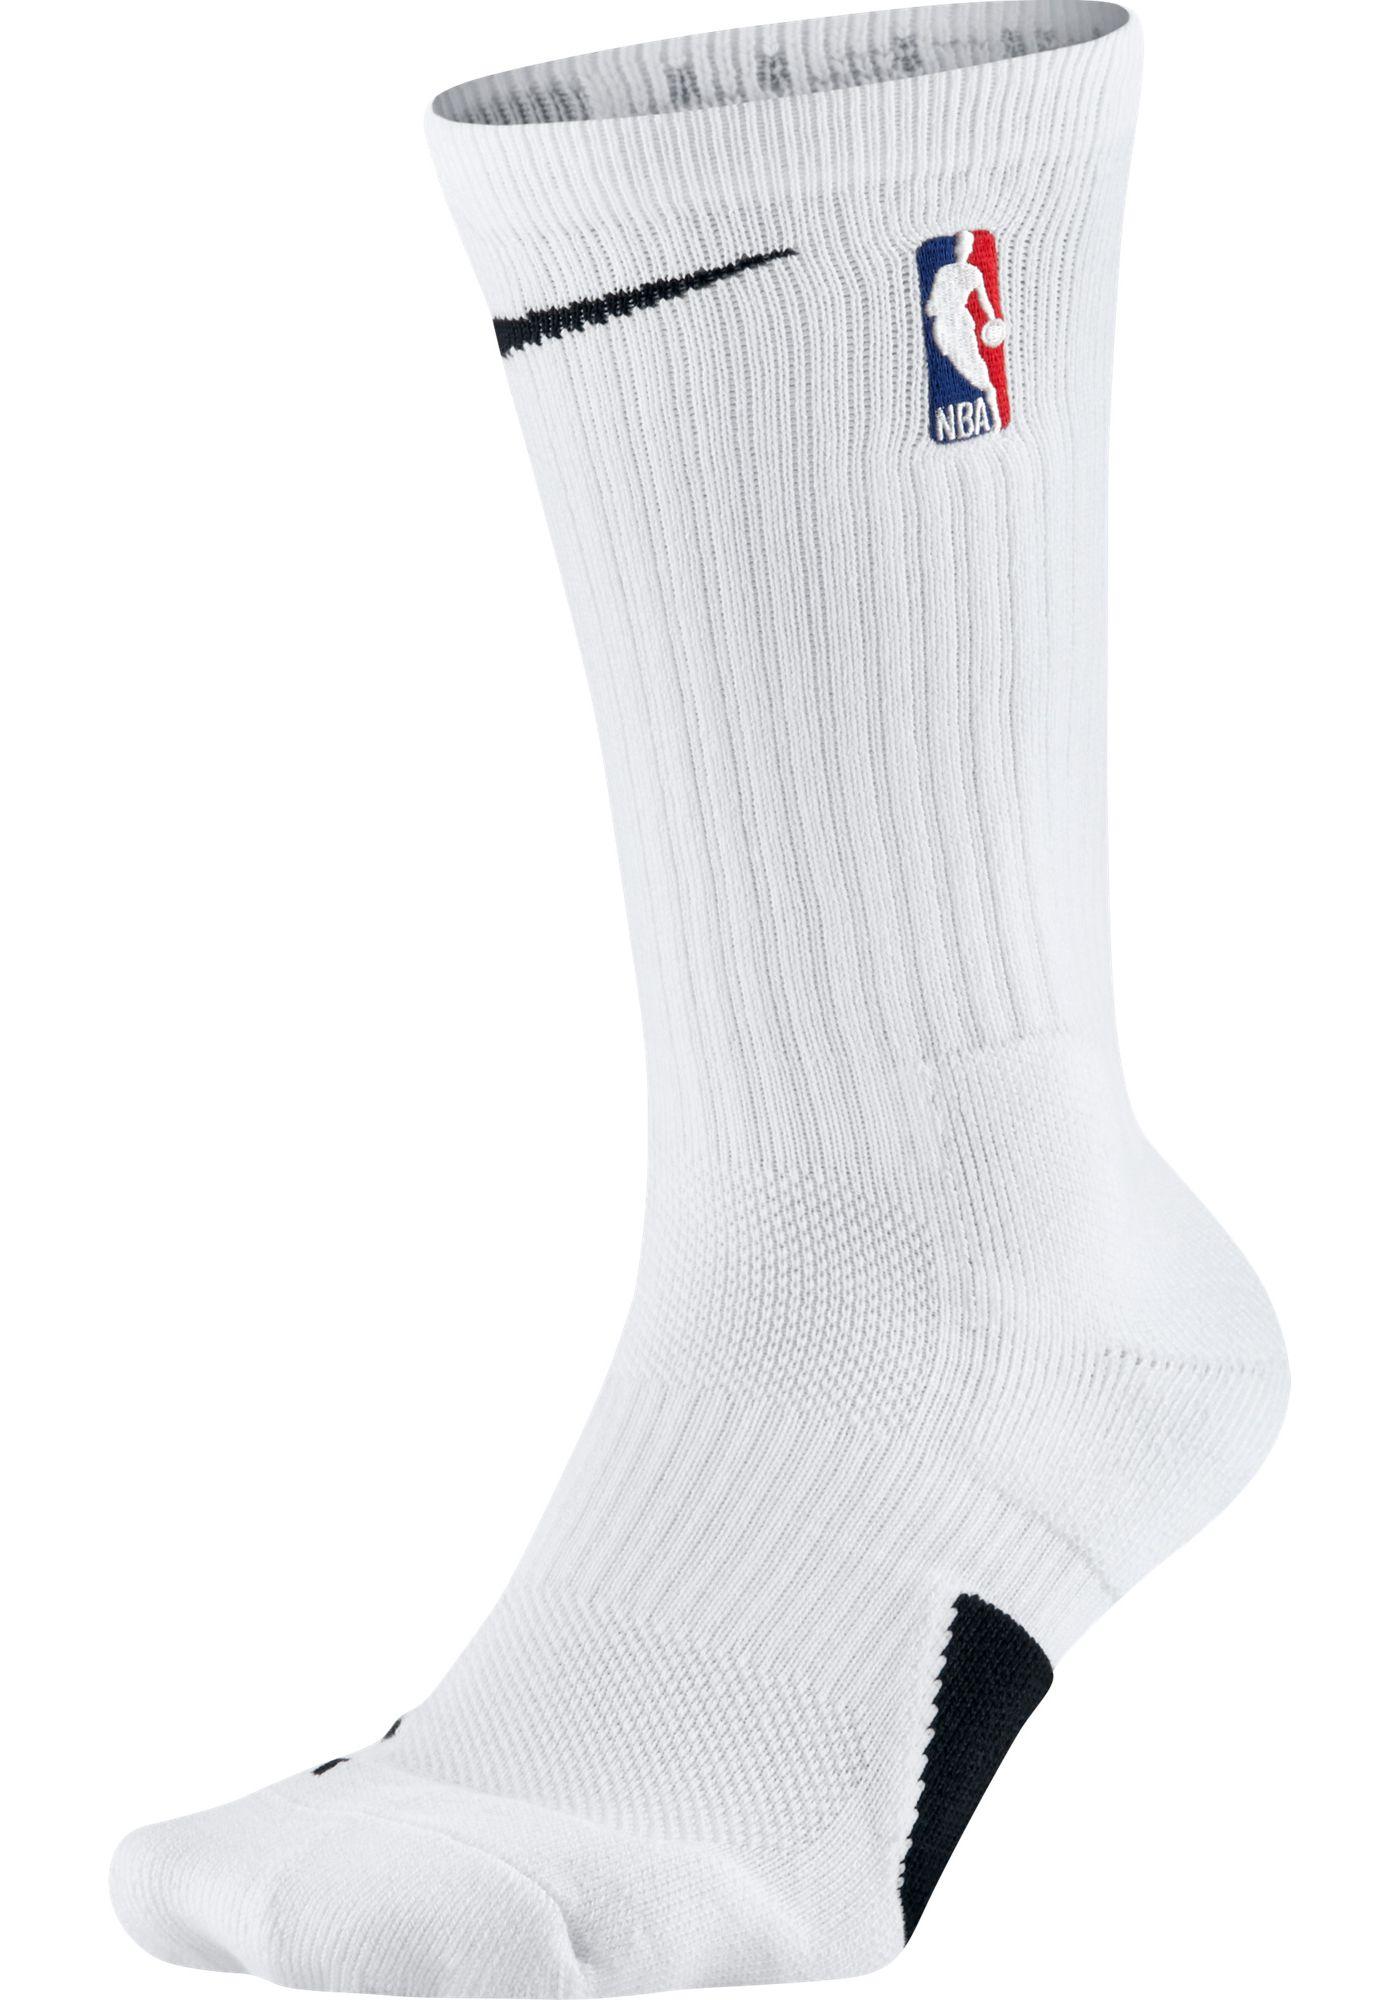 Nike NBA League White Elite Crew Socks